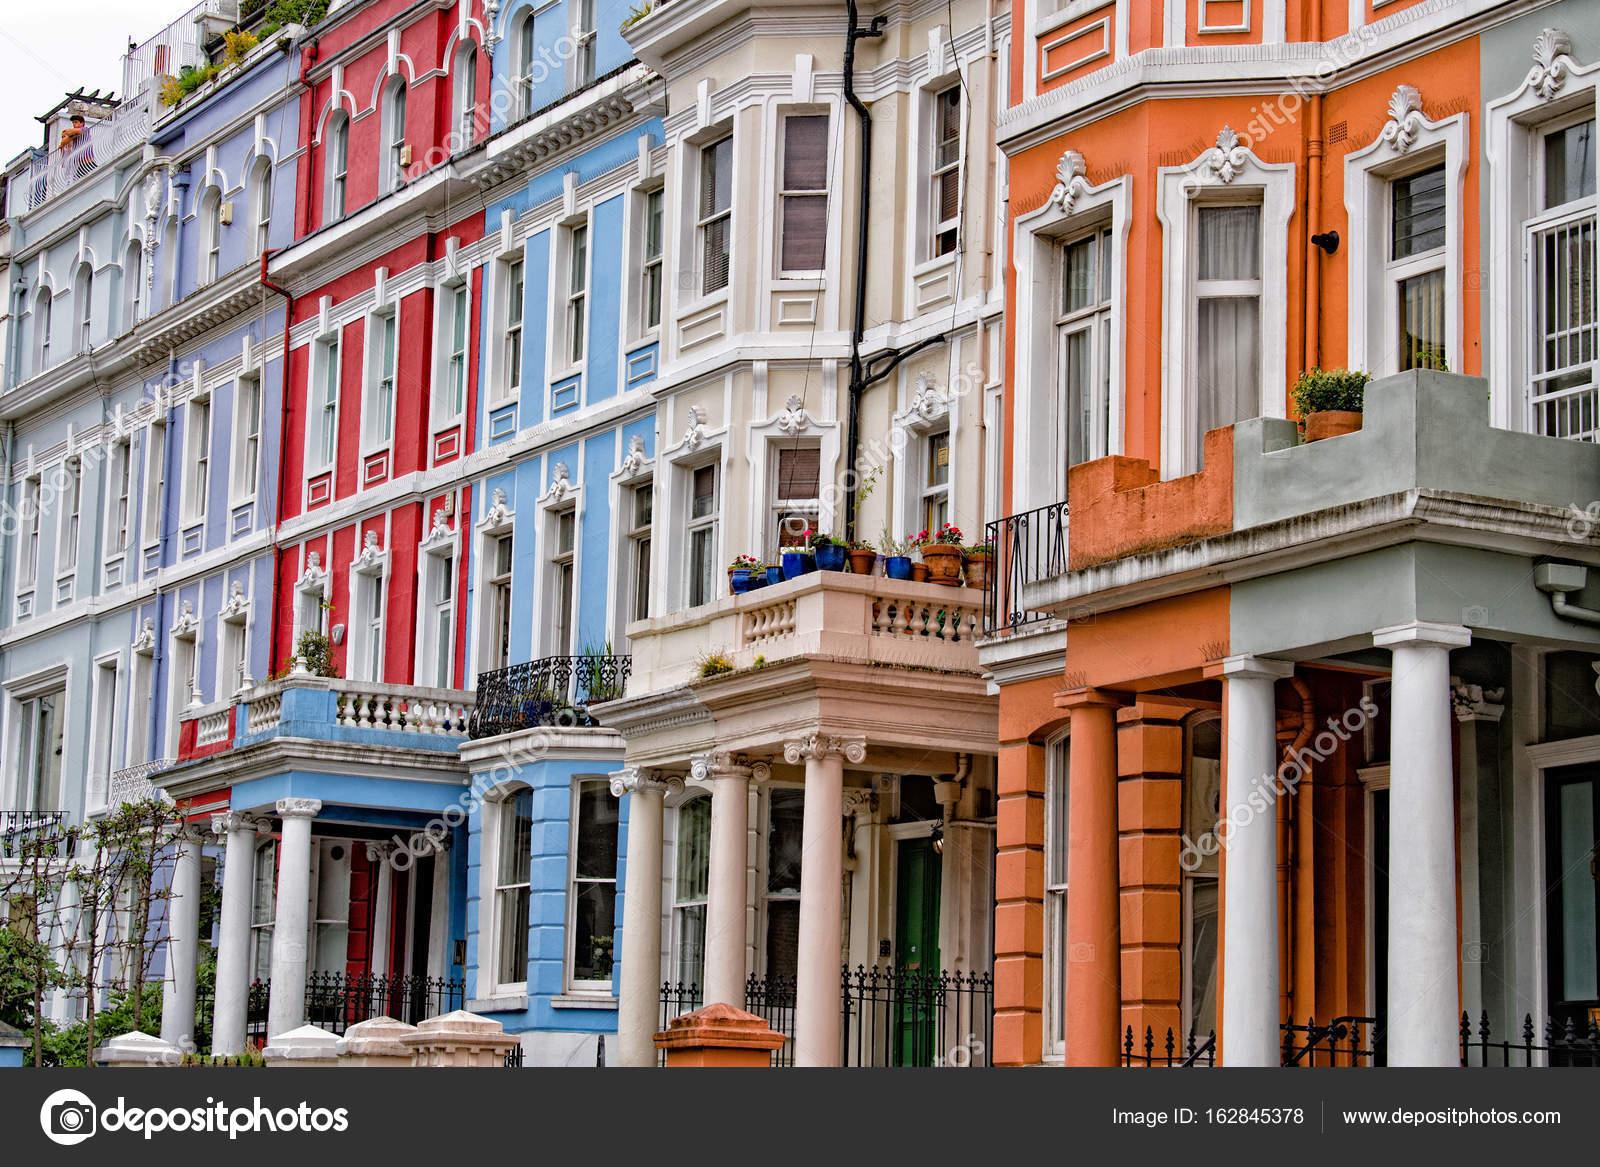 Portobello Road London Street Colorful Buildings Stock Photo